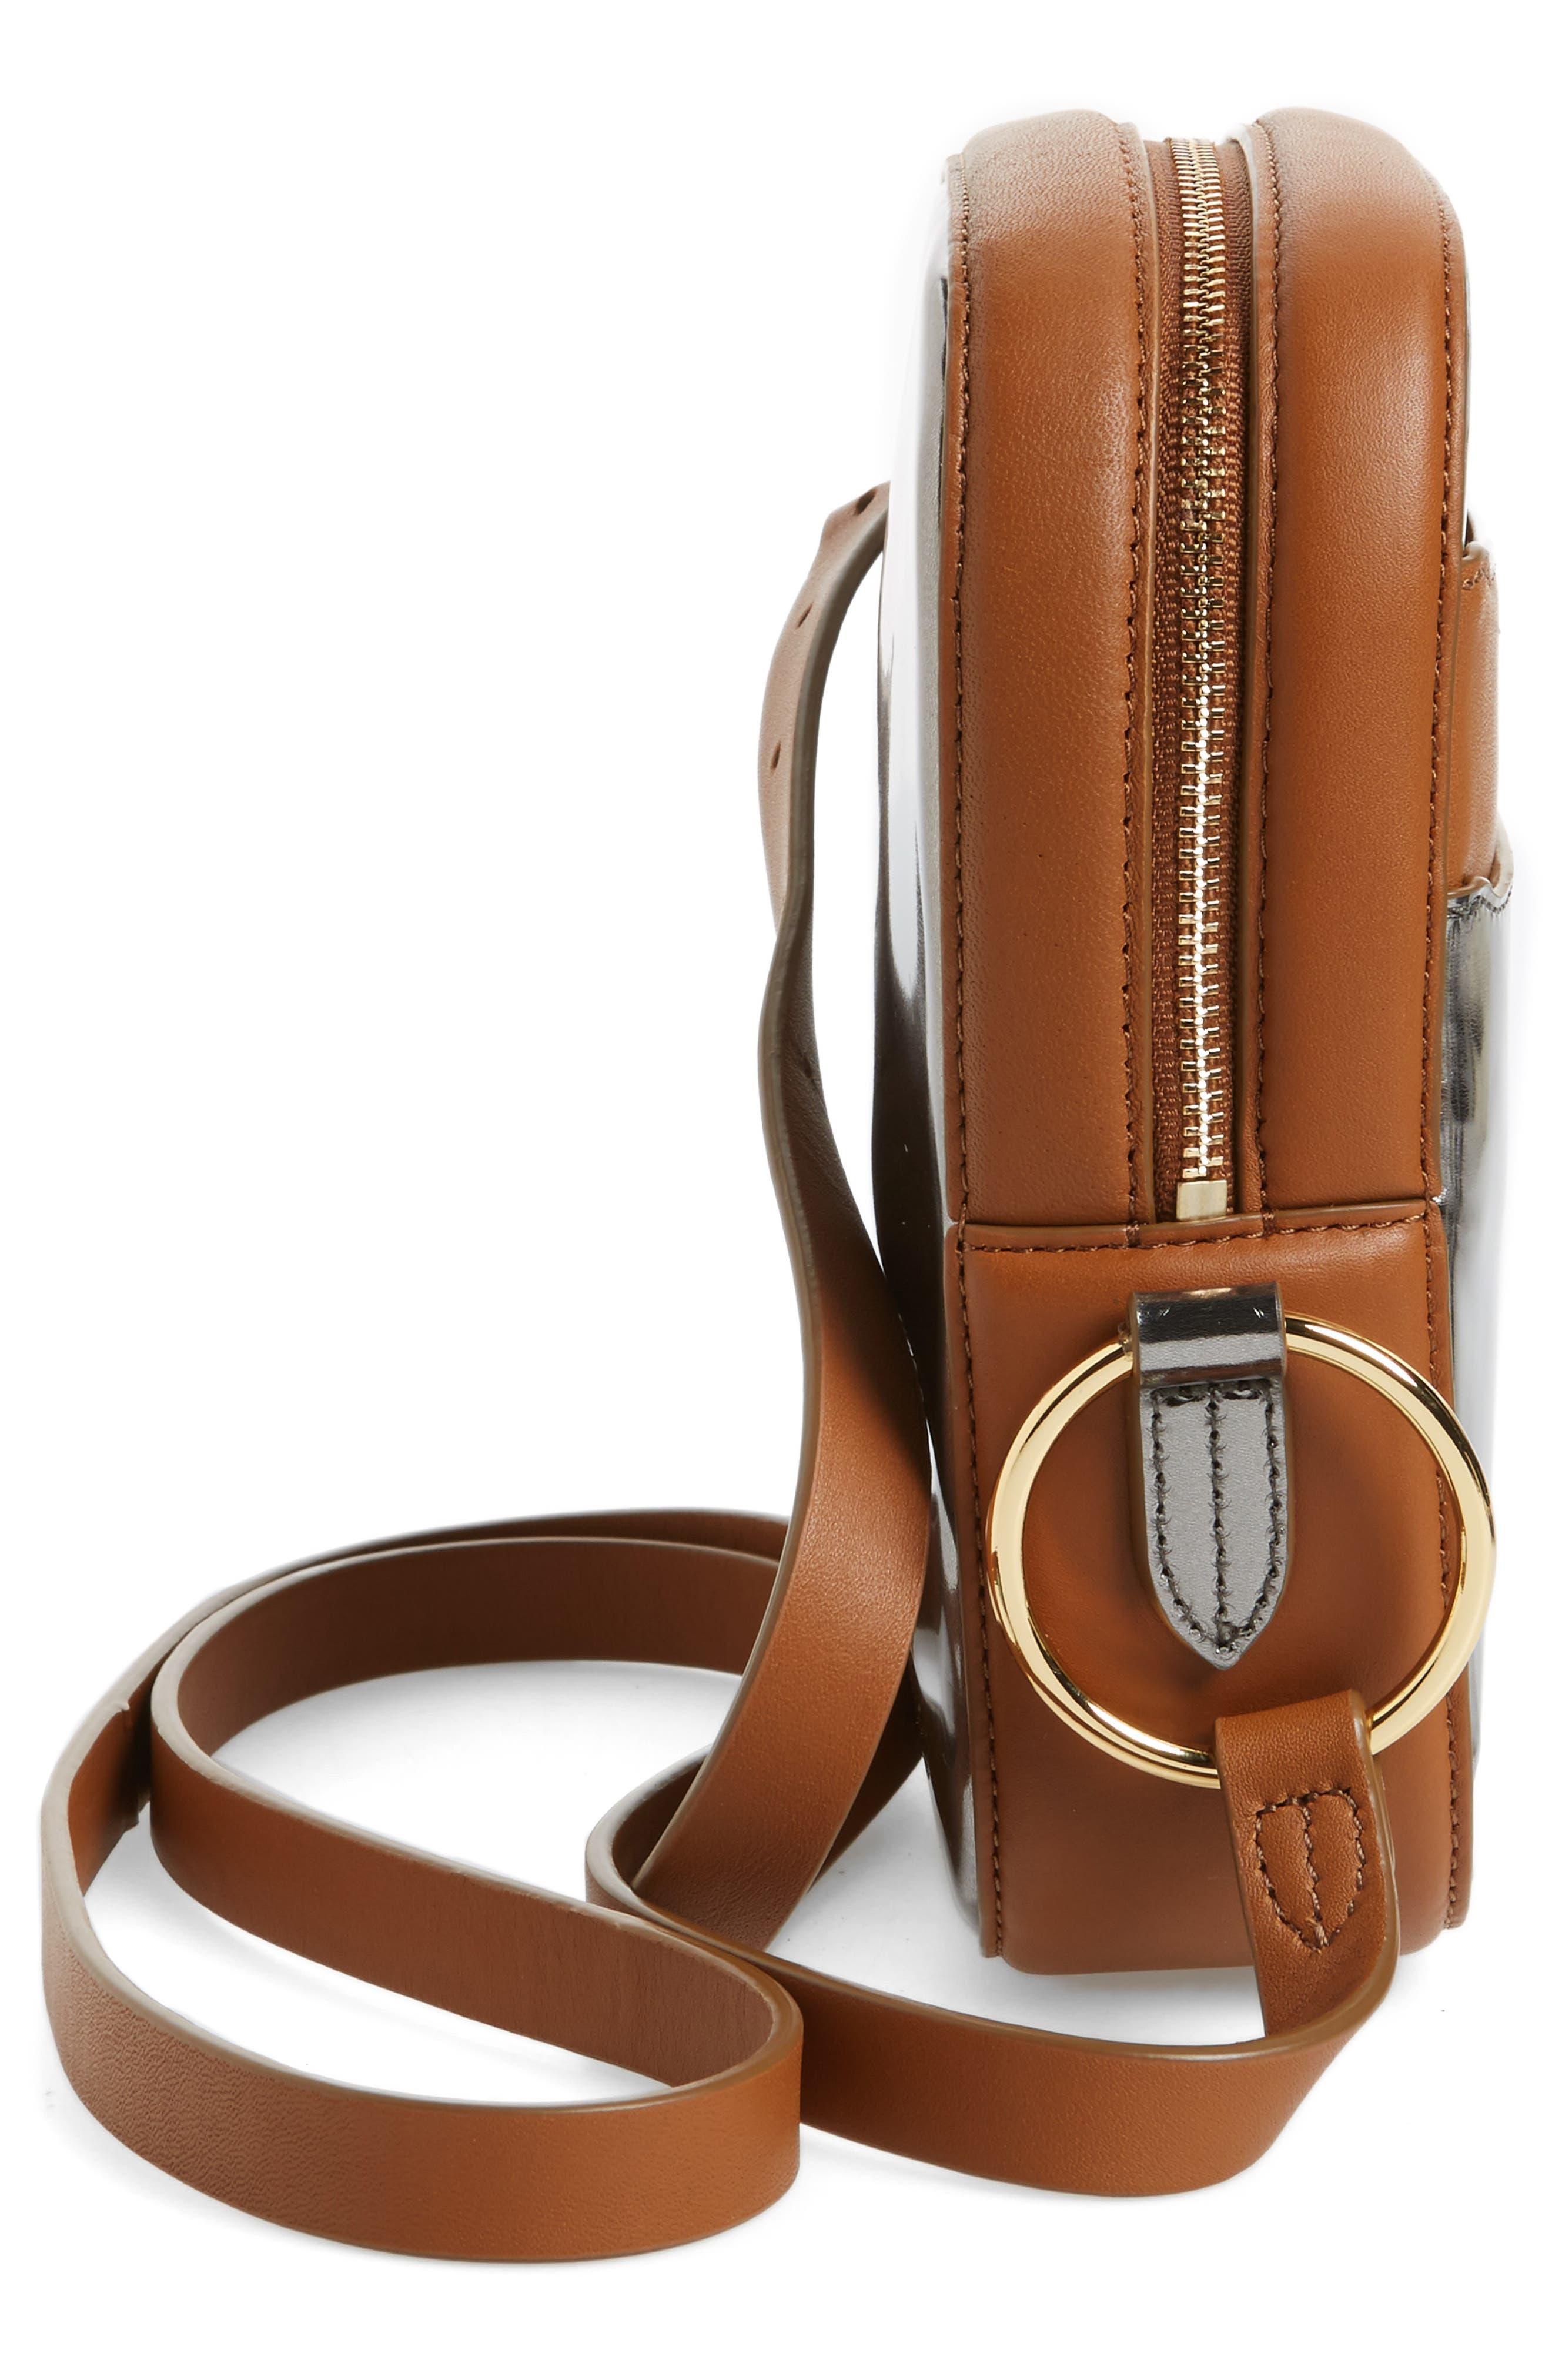 Specchio Leather Camera Bag,                             Alternate thumbnail 5, color,                             040